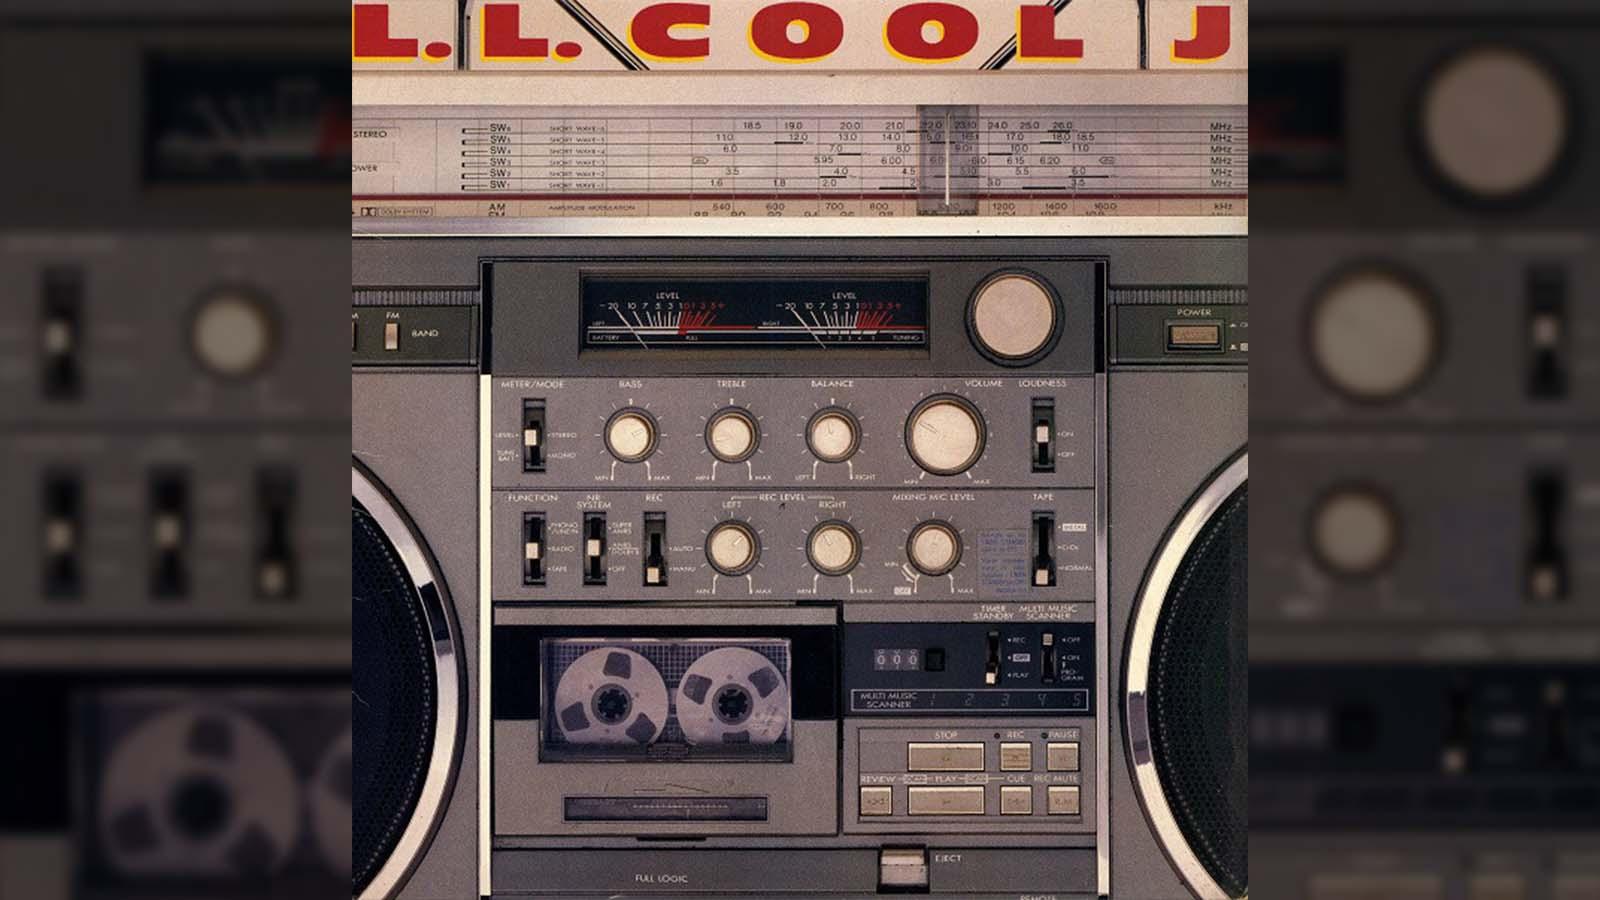 Boombox JVC RC-M90 LL Cool J album cover